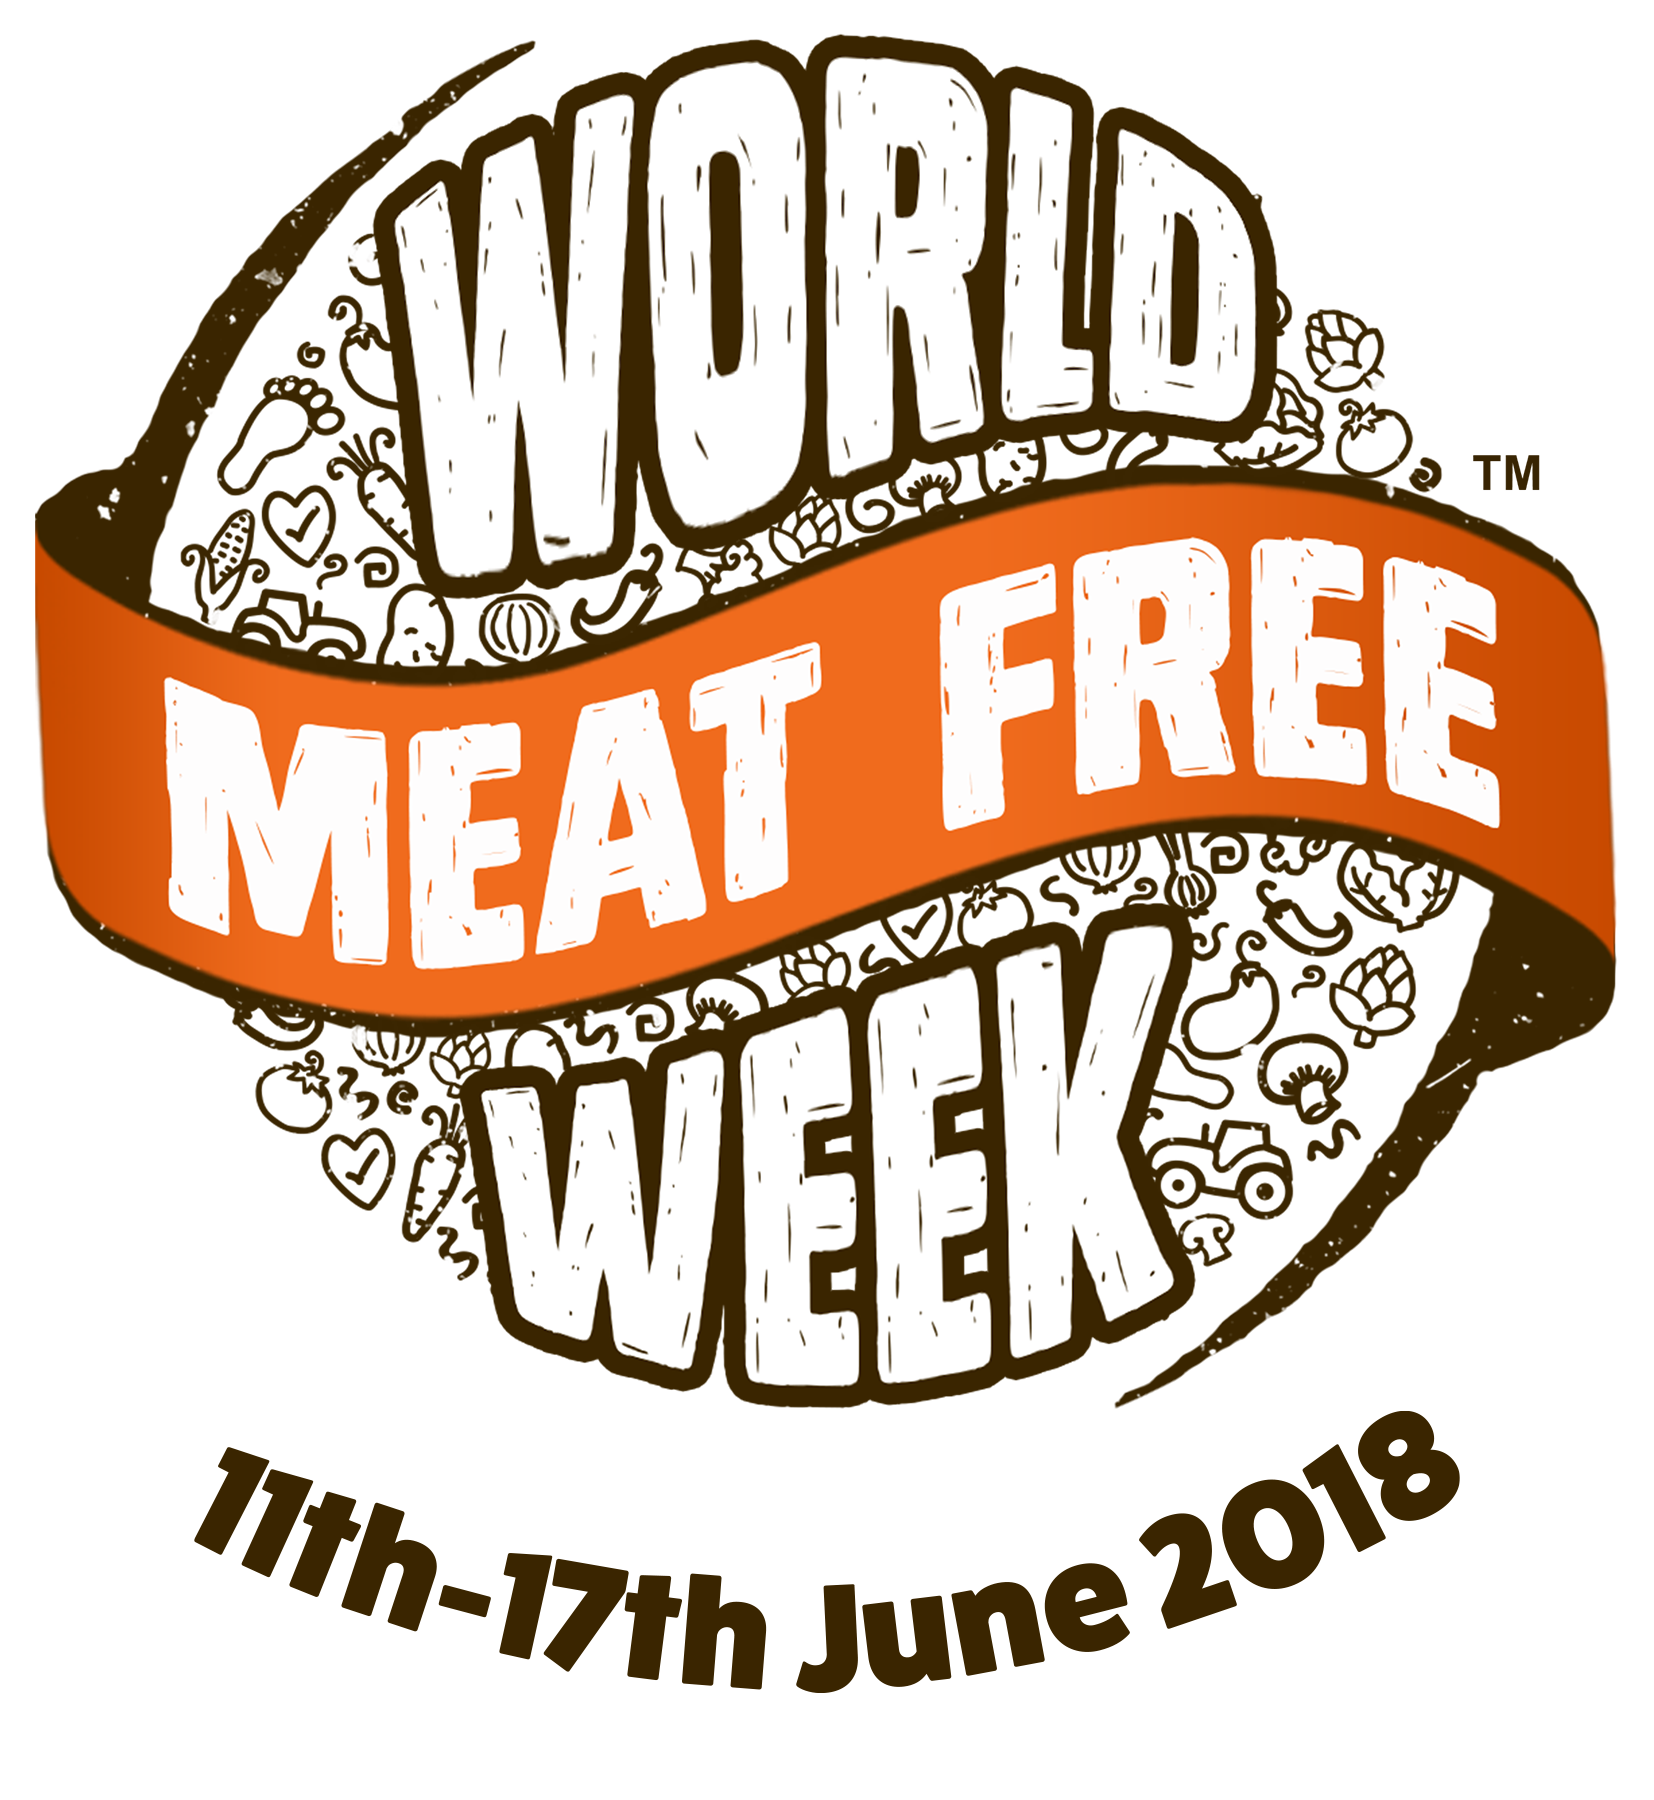 World Meatfree Week 11th-17th June 2018